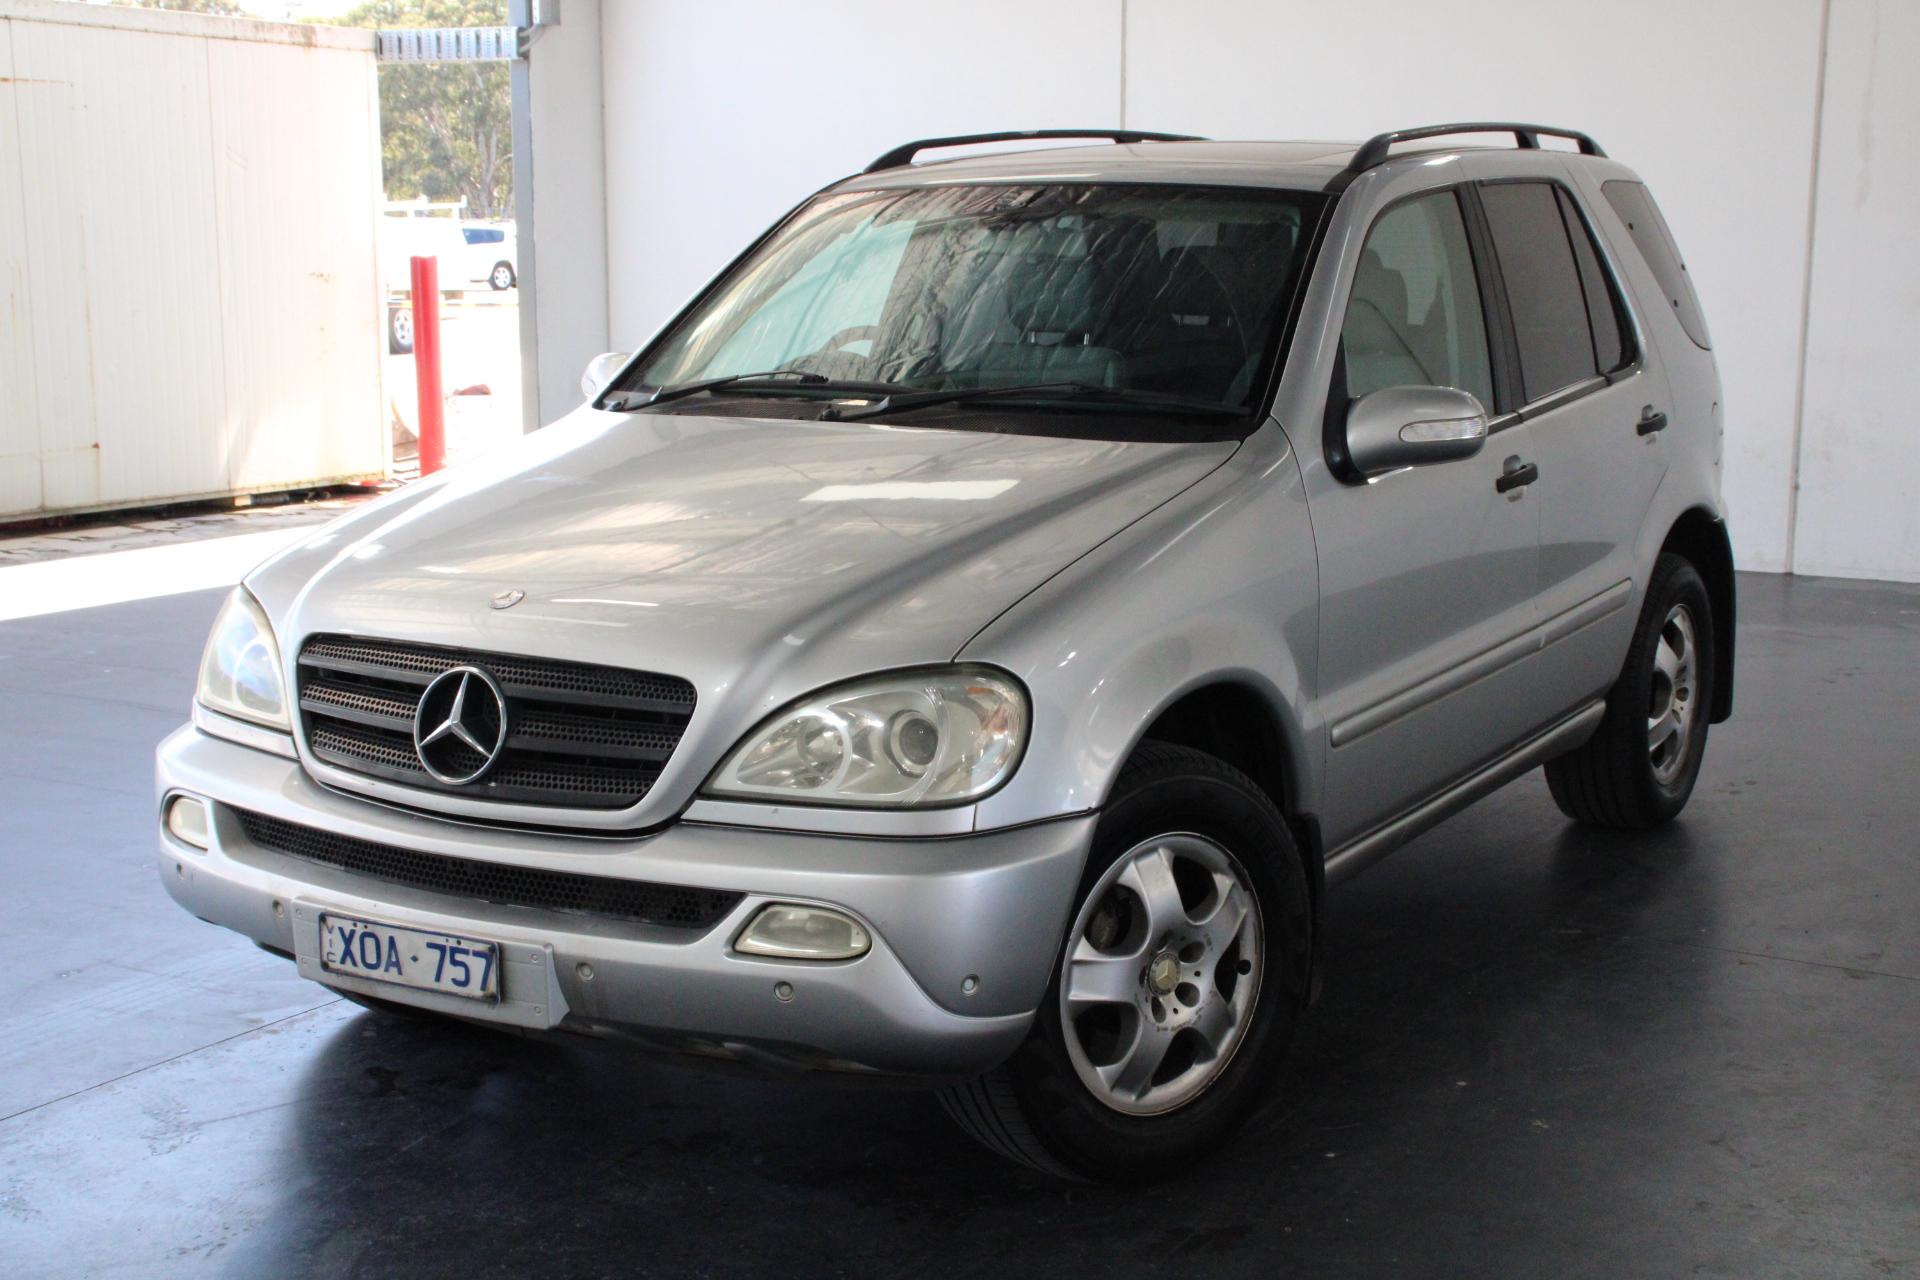 2004 Mercedes Benz ML 270 CDI (4x4) W163 Turbo Diesel Automatic Wagon